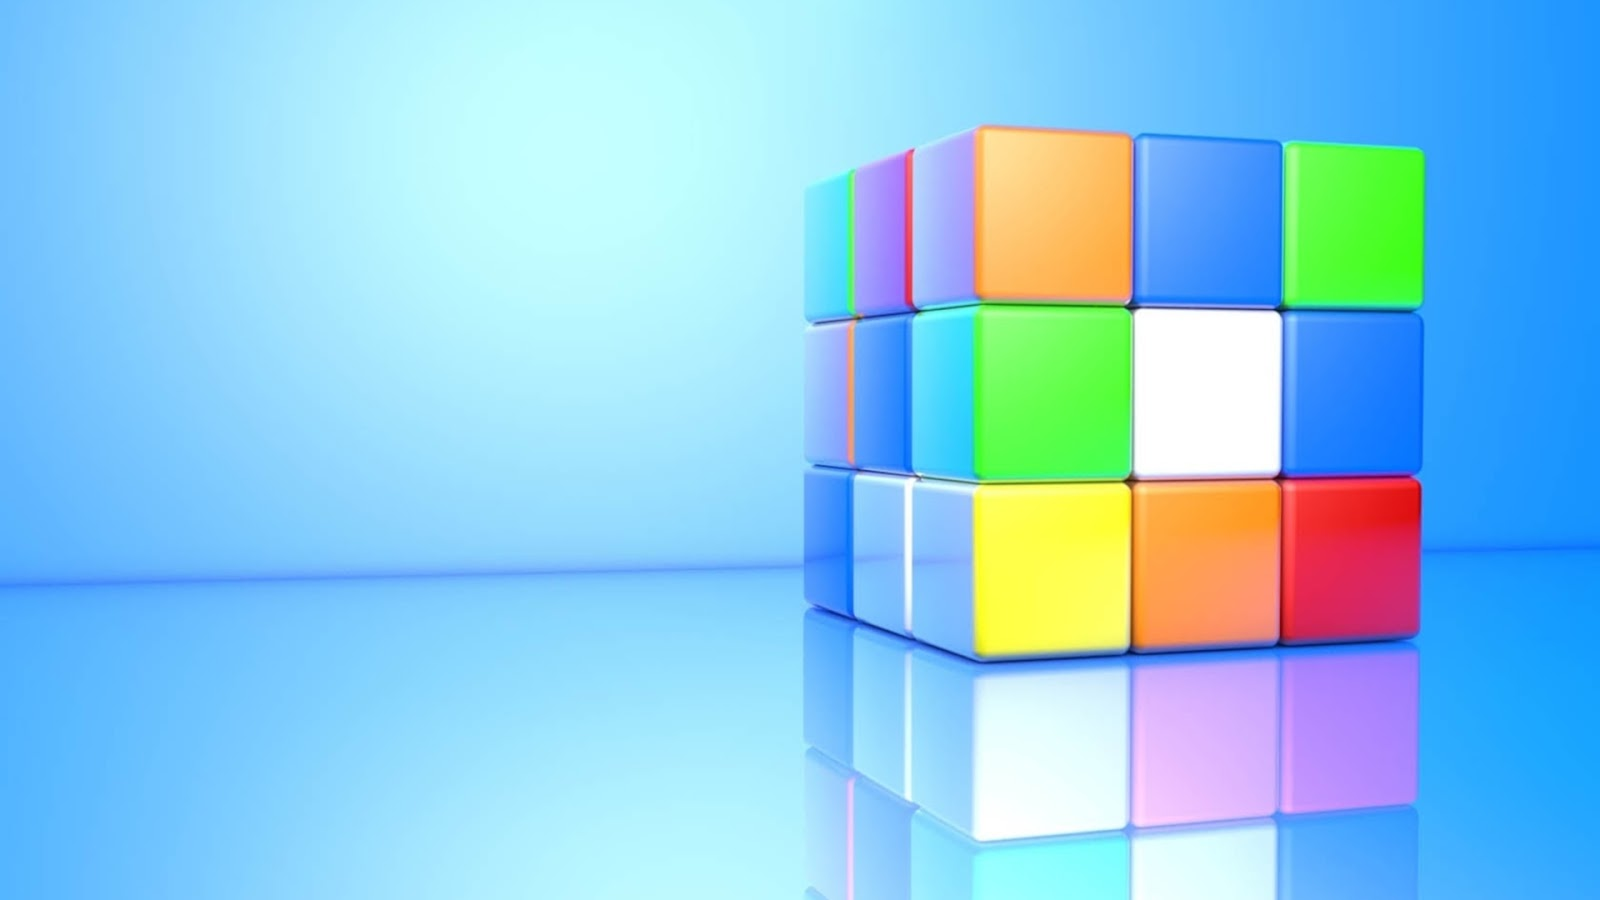 Mystery Wallpaper 3D Rubiks Cube 1600x900